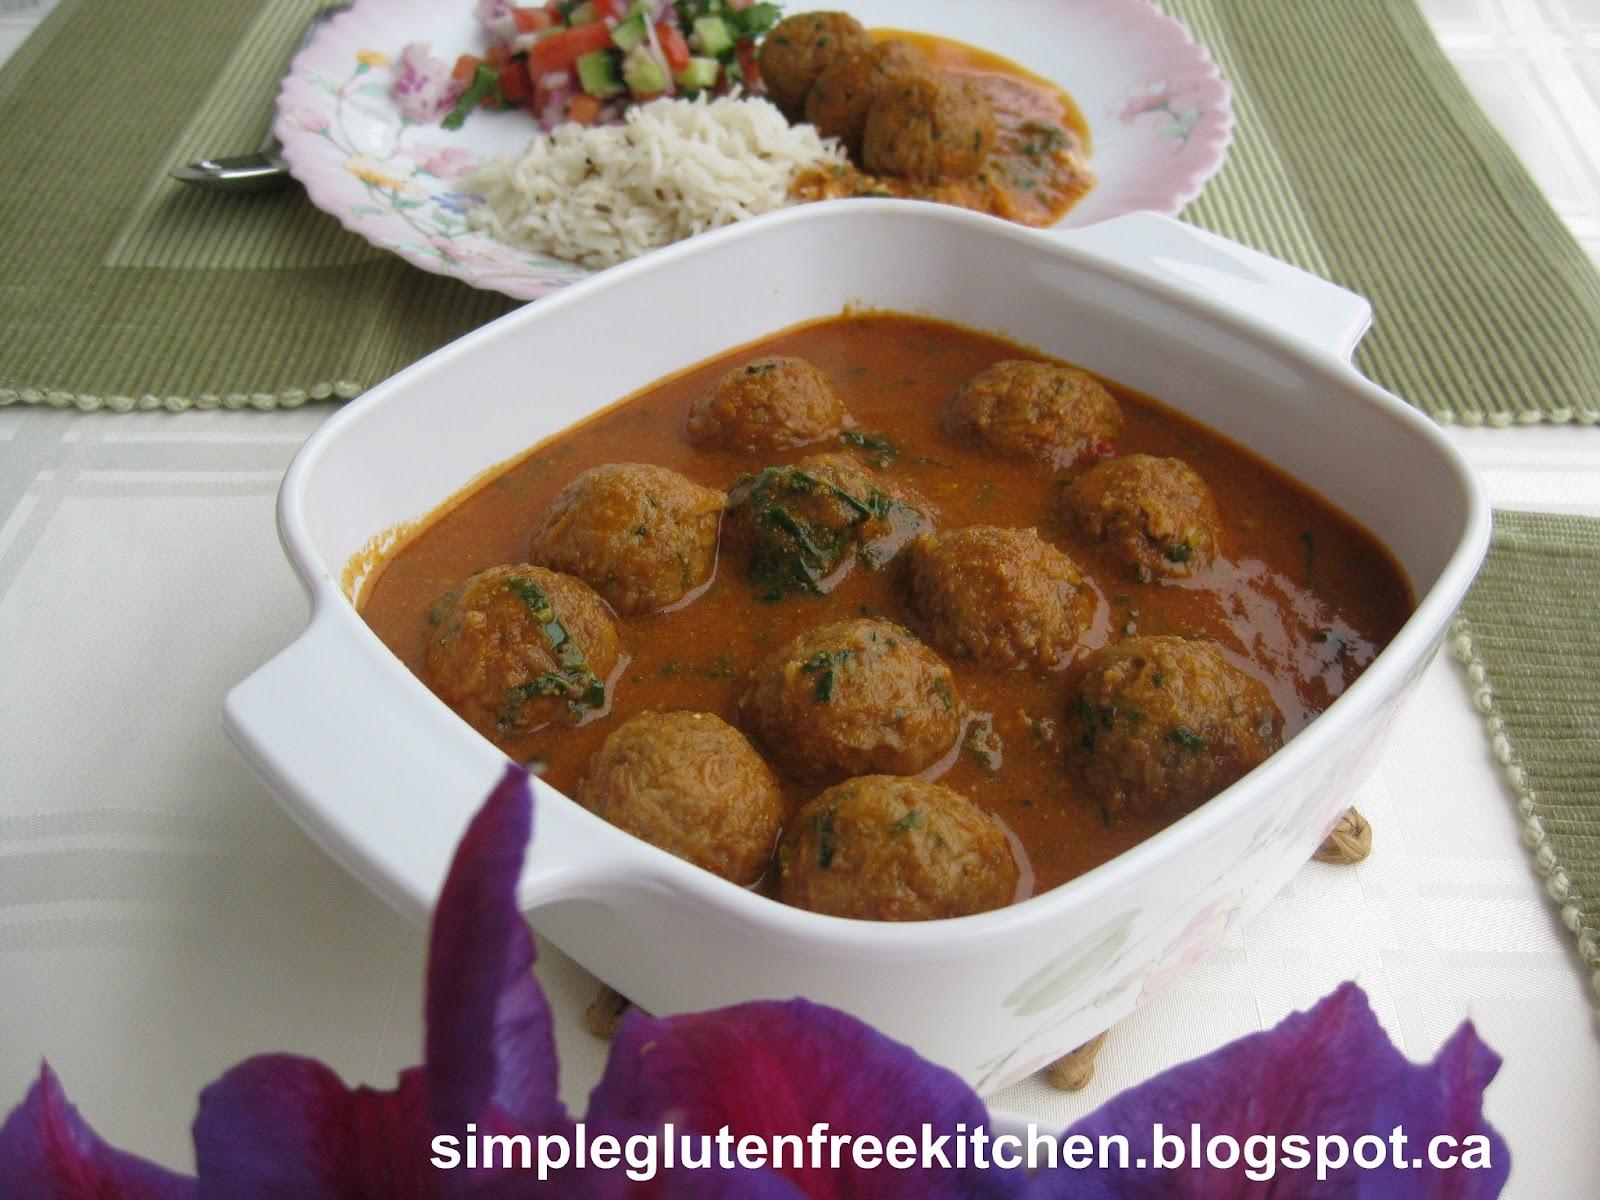 Lotus Root Kofta Curry Weekend Brunch Simple Gluten Free Kitchen